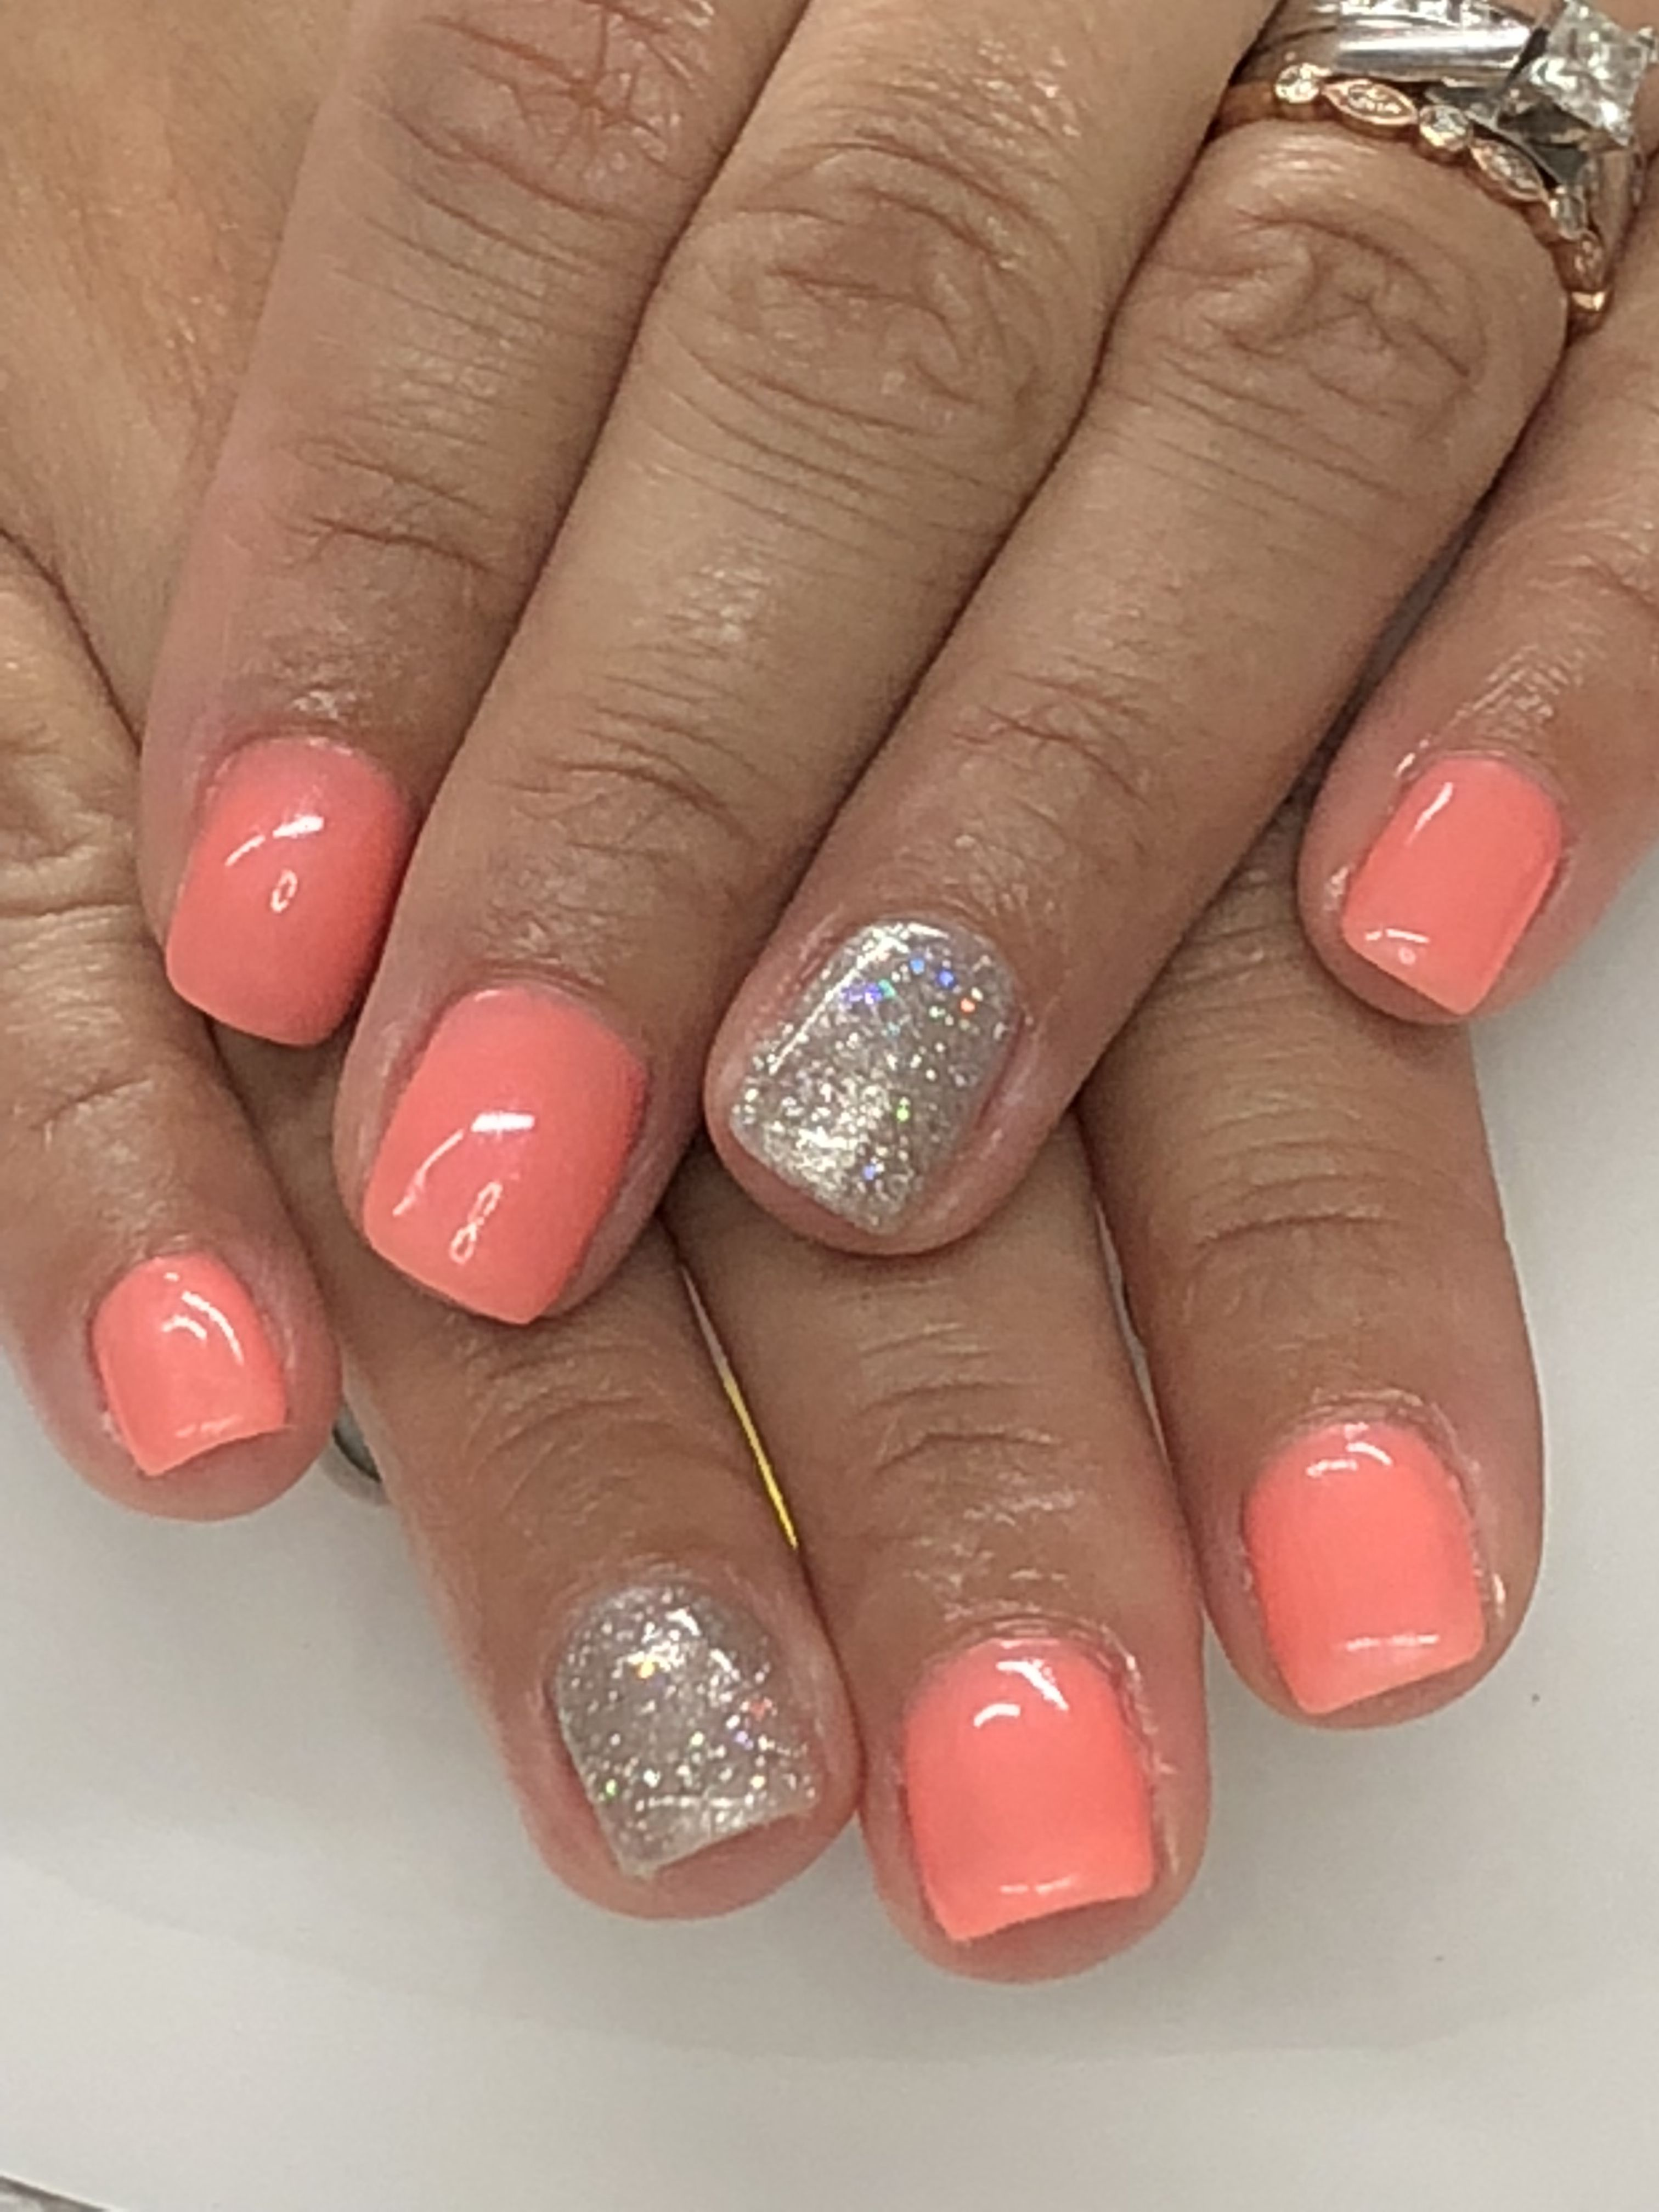 Ideas of coral nails - The Best Images | BestArtNails.com